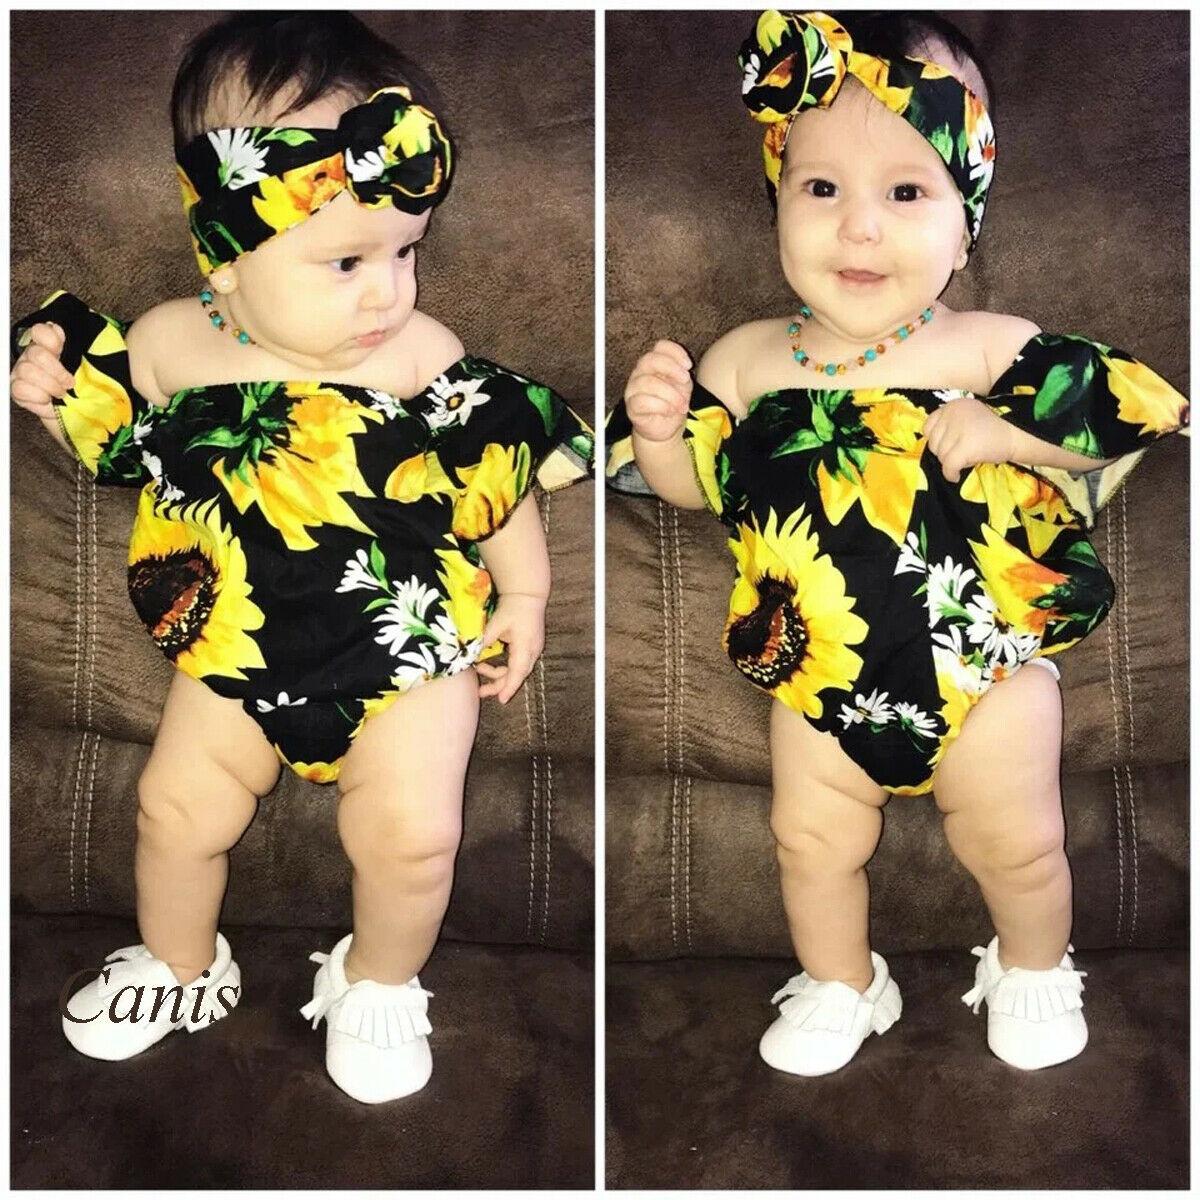 Newborn Baby Girl Summer Clothes Sunflower Print Off Shoulder Bodysuits Sunsuit Headband 2pcs Outfits Set